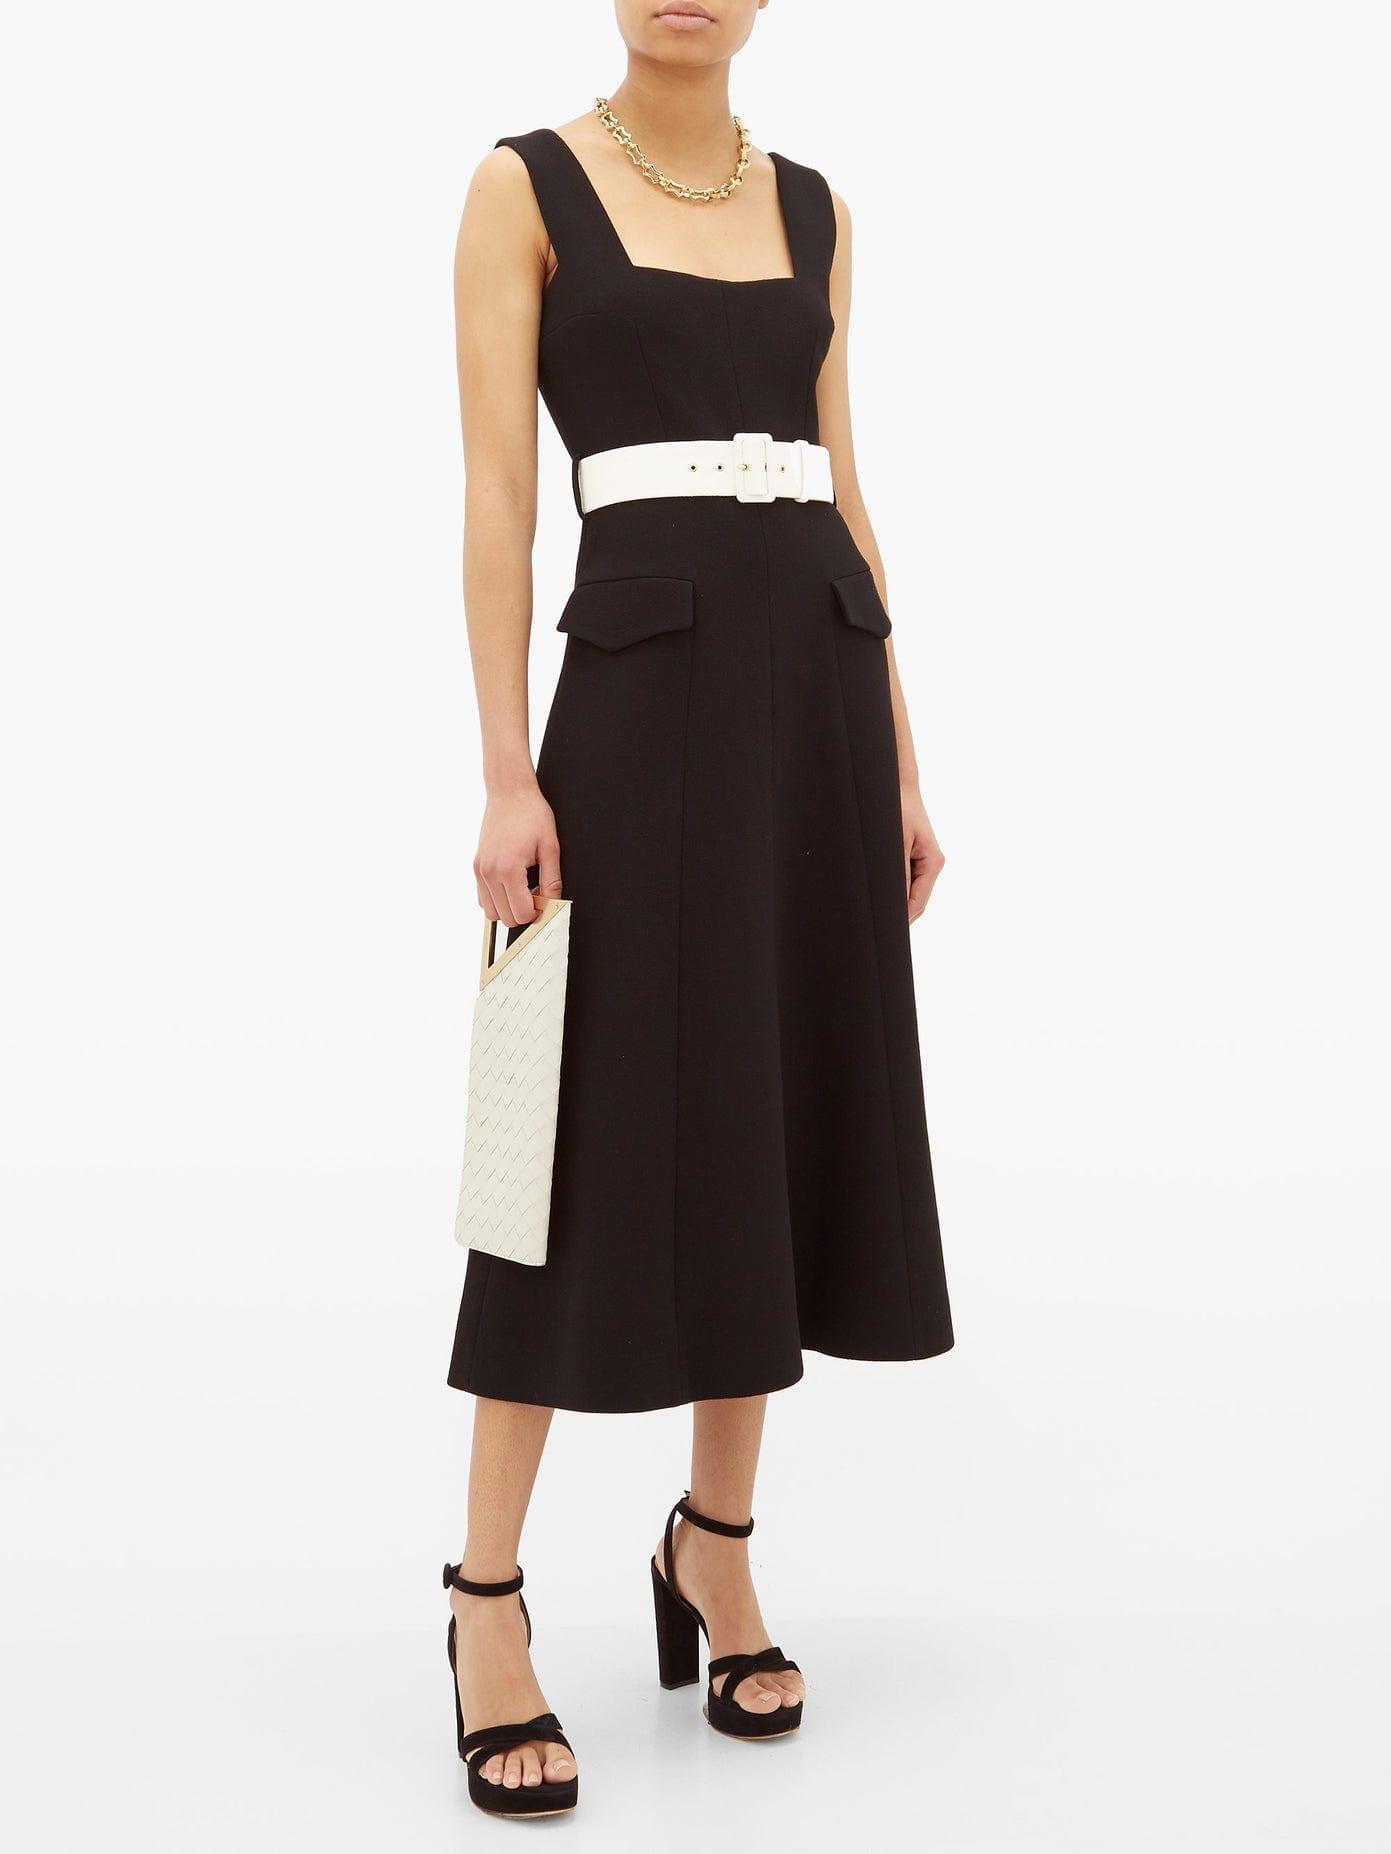 EMILIA WICKSTEAD Petra Belted Wool-Crepe Midi Dress